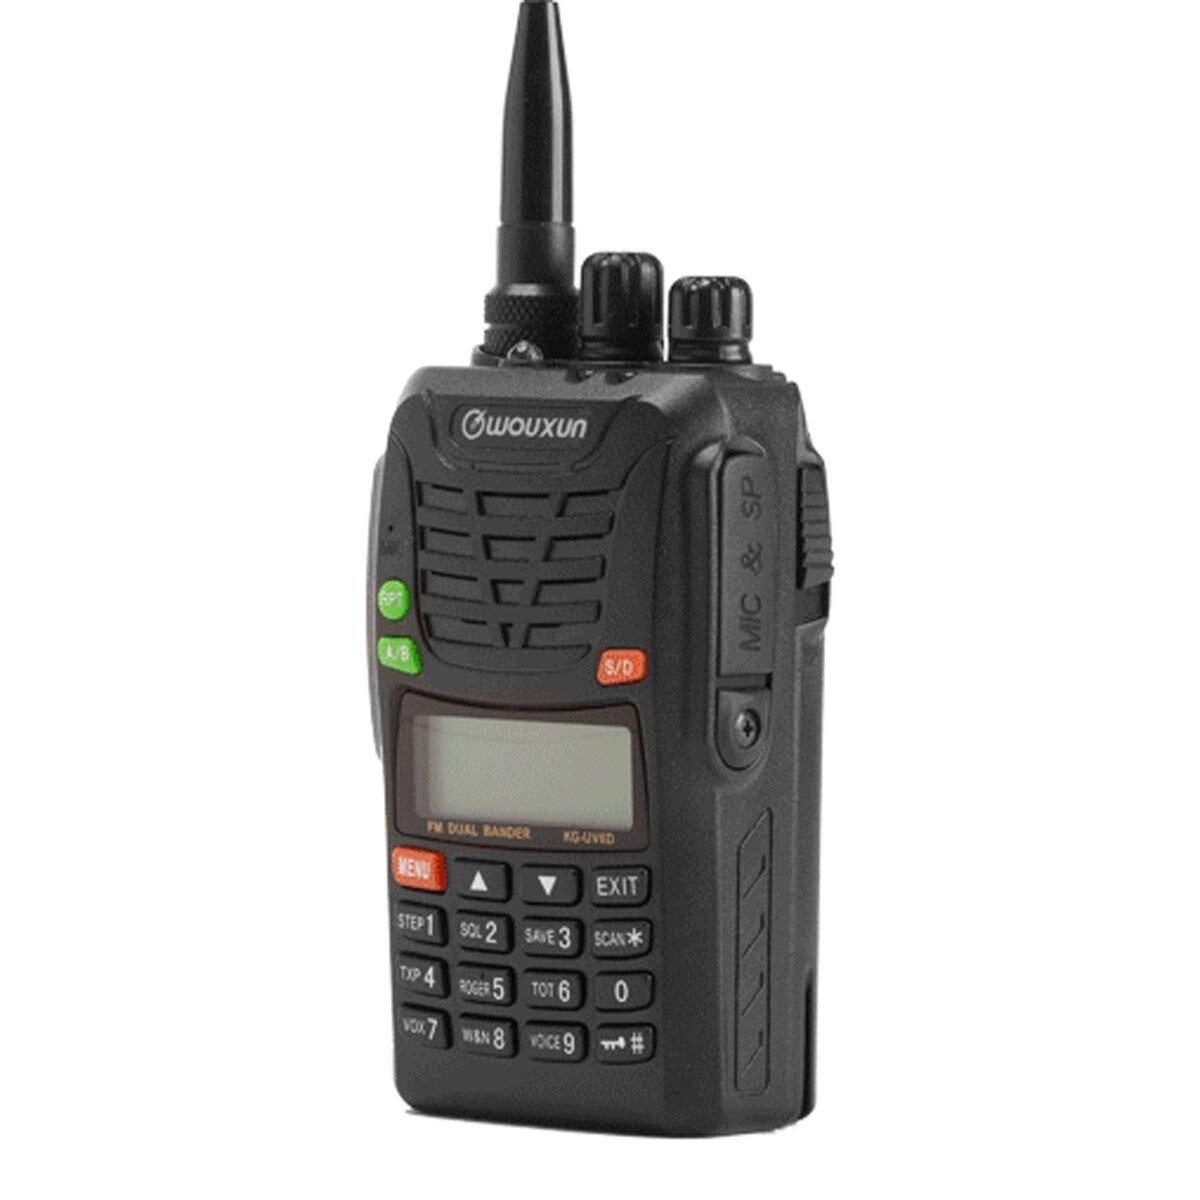 Wouxun KG-UV6D Double Bande Radio Bidirectionnelle avec 1700 mah Batterie CE FCC Approbation UV6D KG-UV6X UHF VHF Ham Radio longue Distance SOS